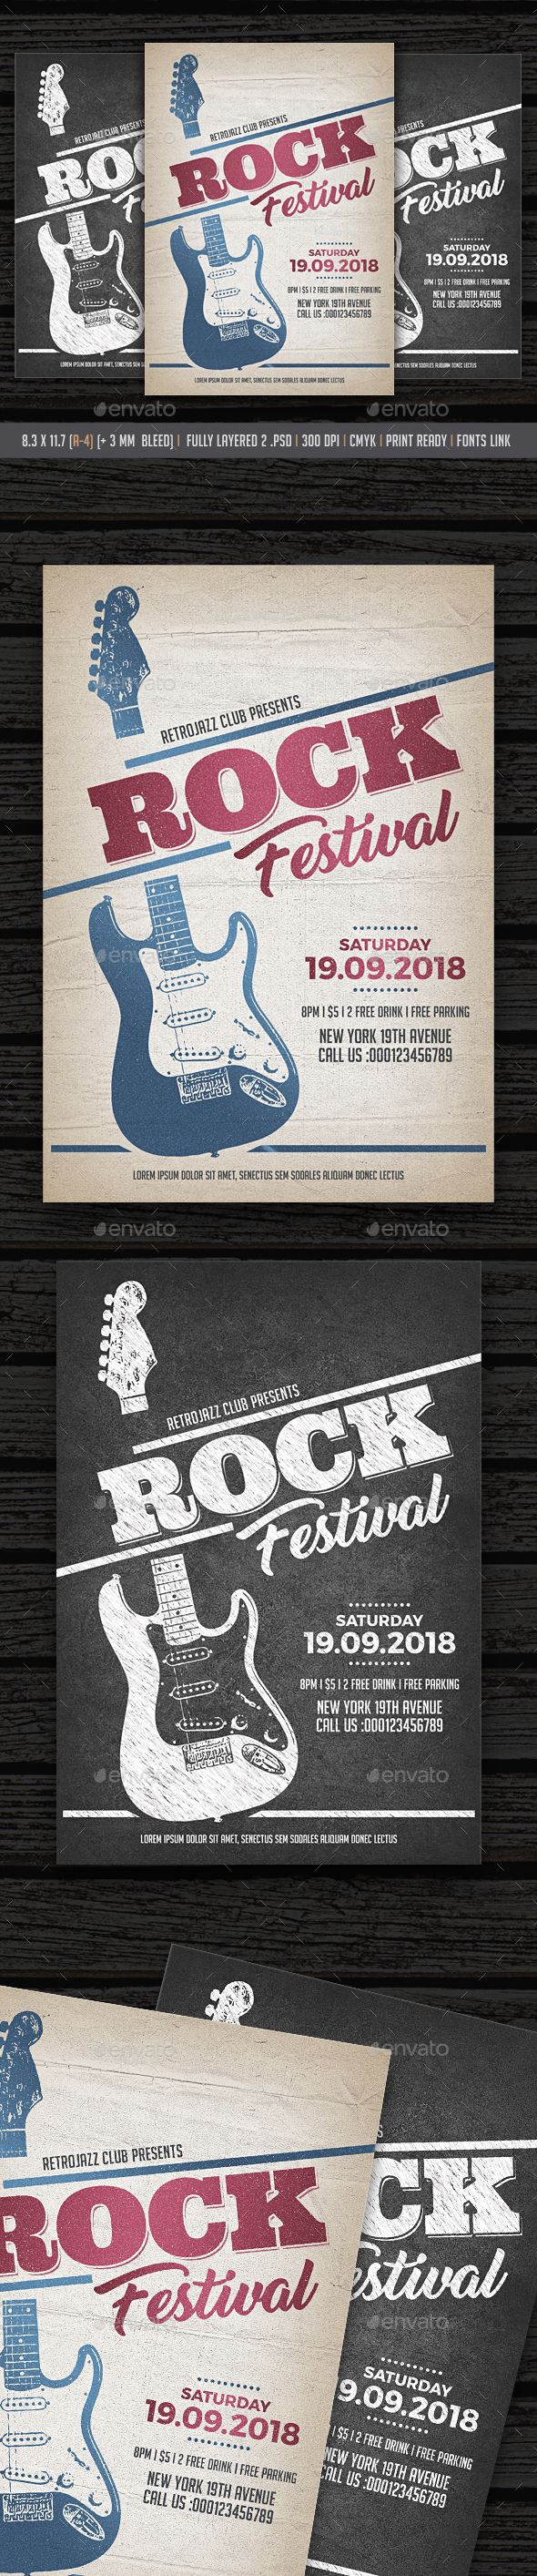 1677 best Event Poster Design images on Pinterest | Graphics ...